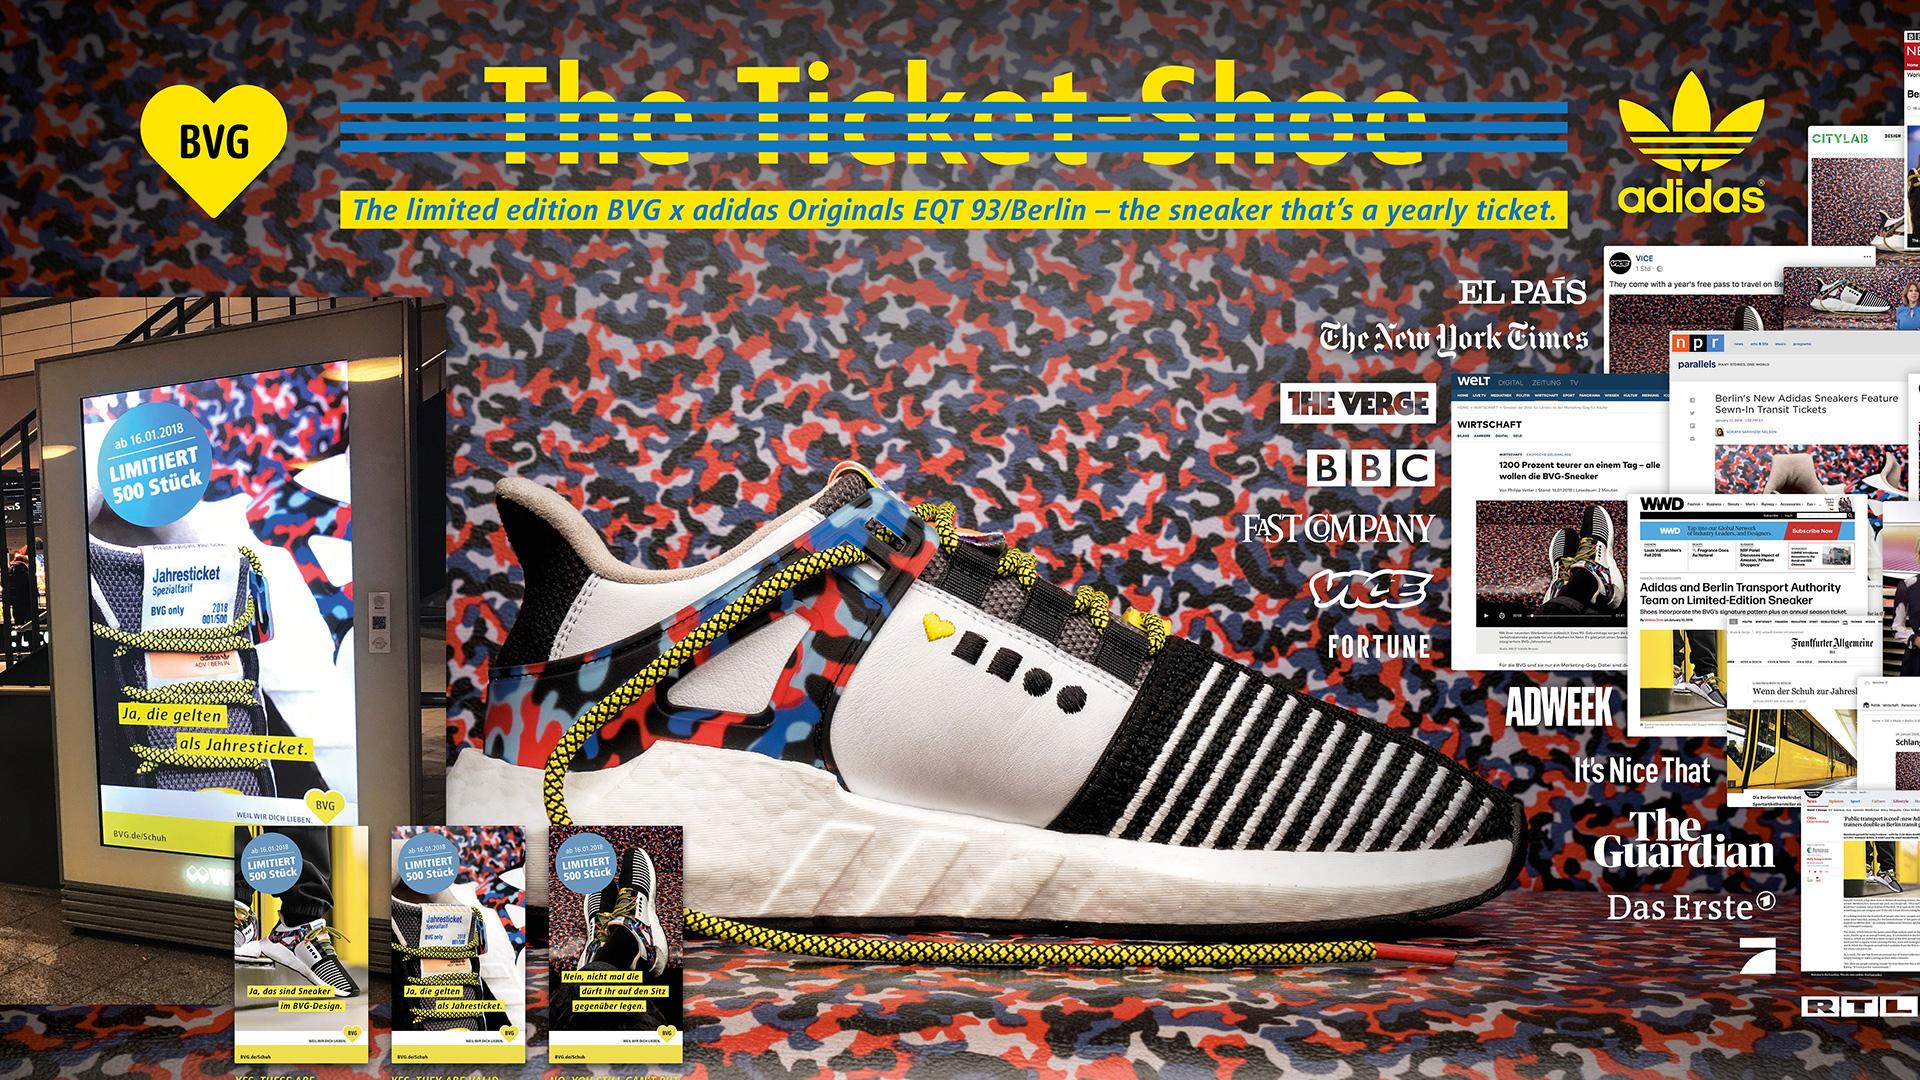 Adidas Bvg X The Online Aq5jlr34 Shoe Ticket Ea891 Buy C546e bm6IgyY7fv